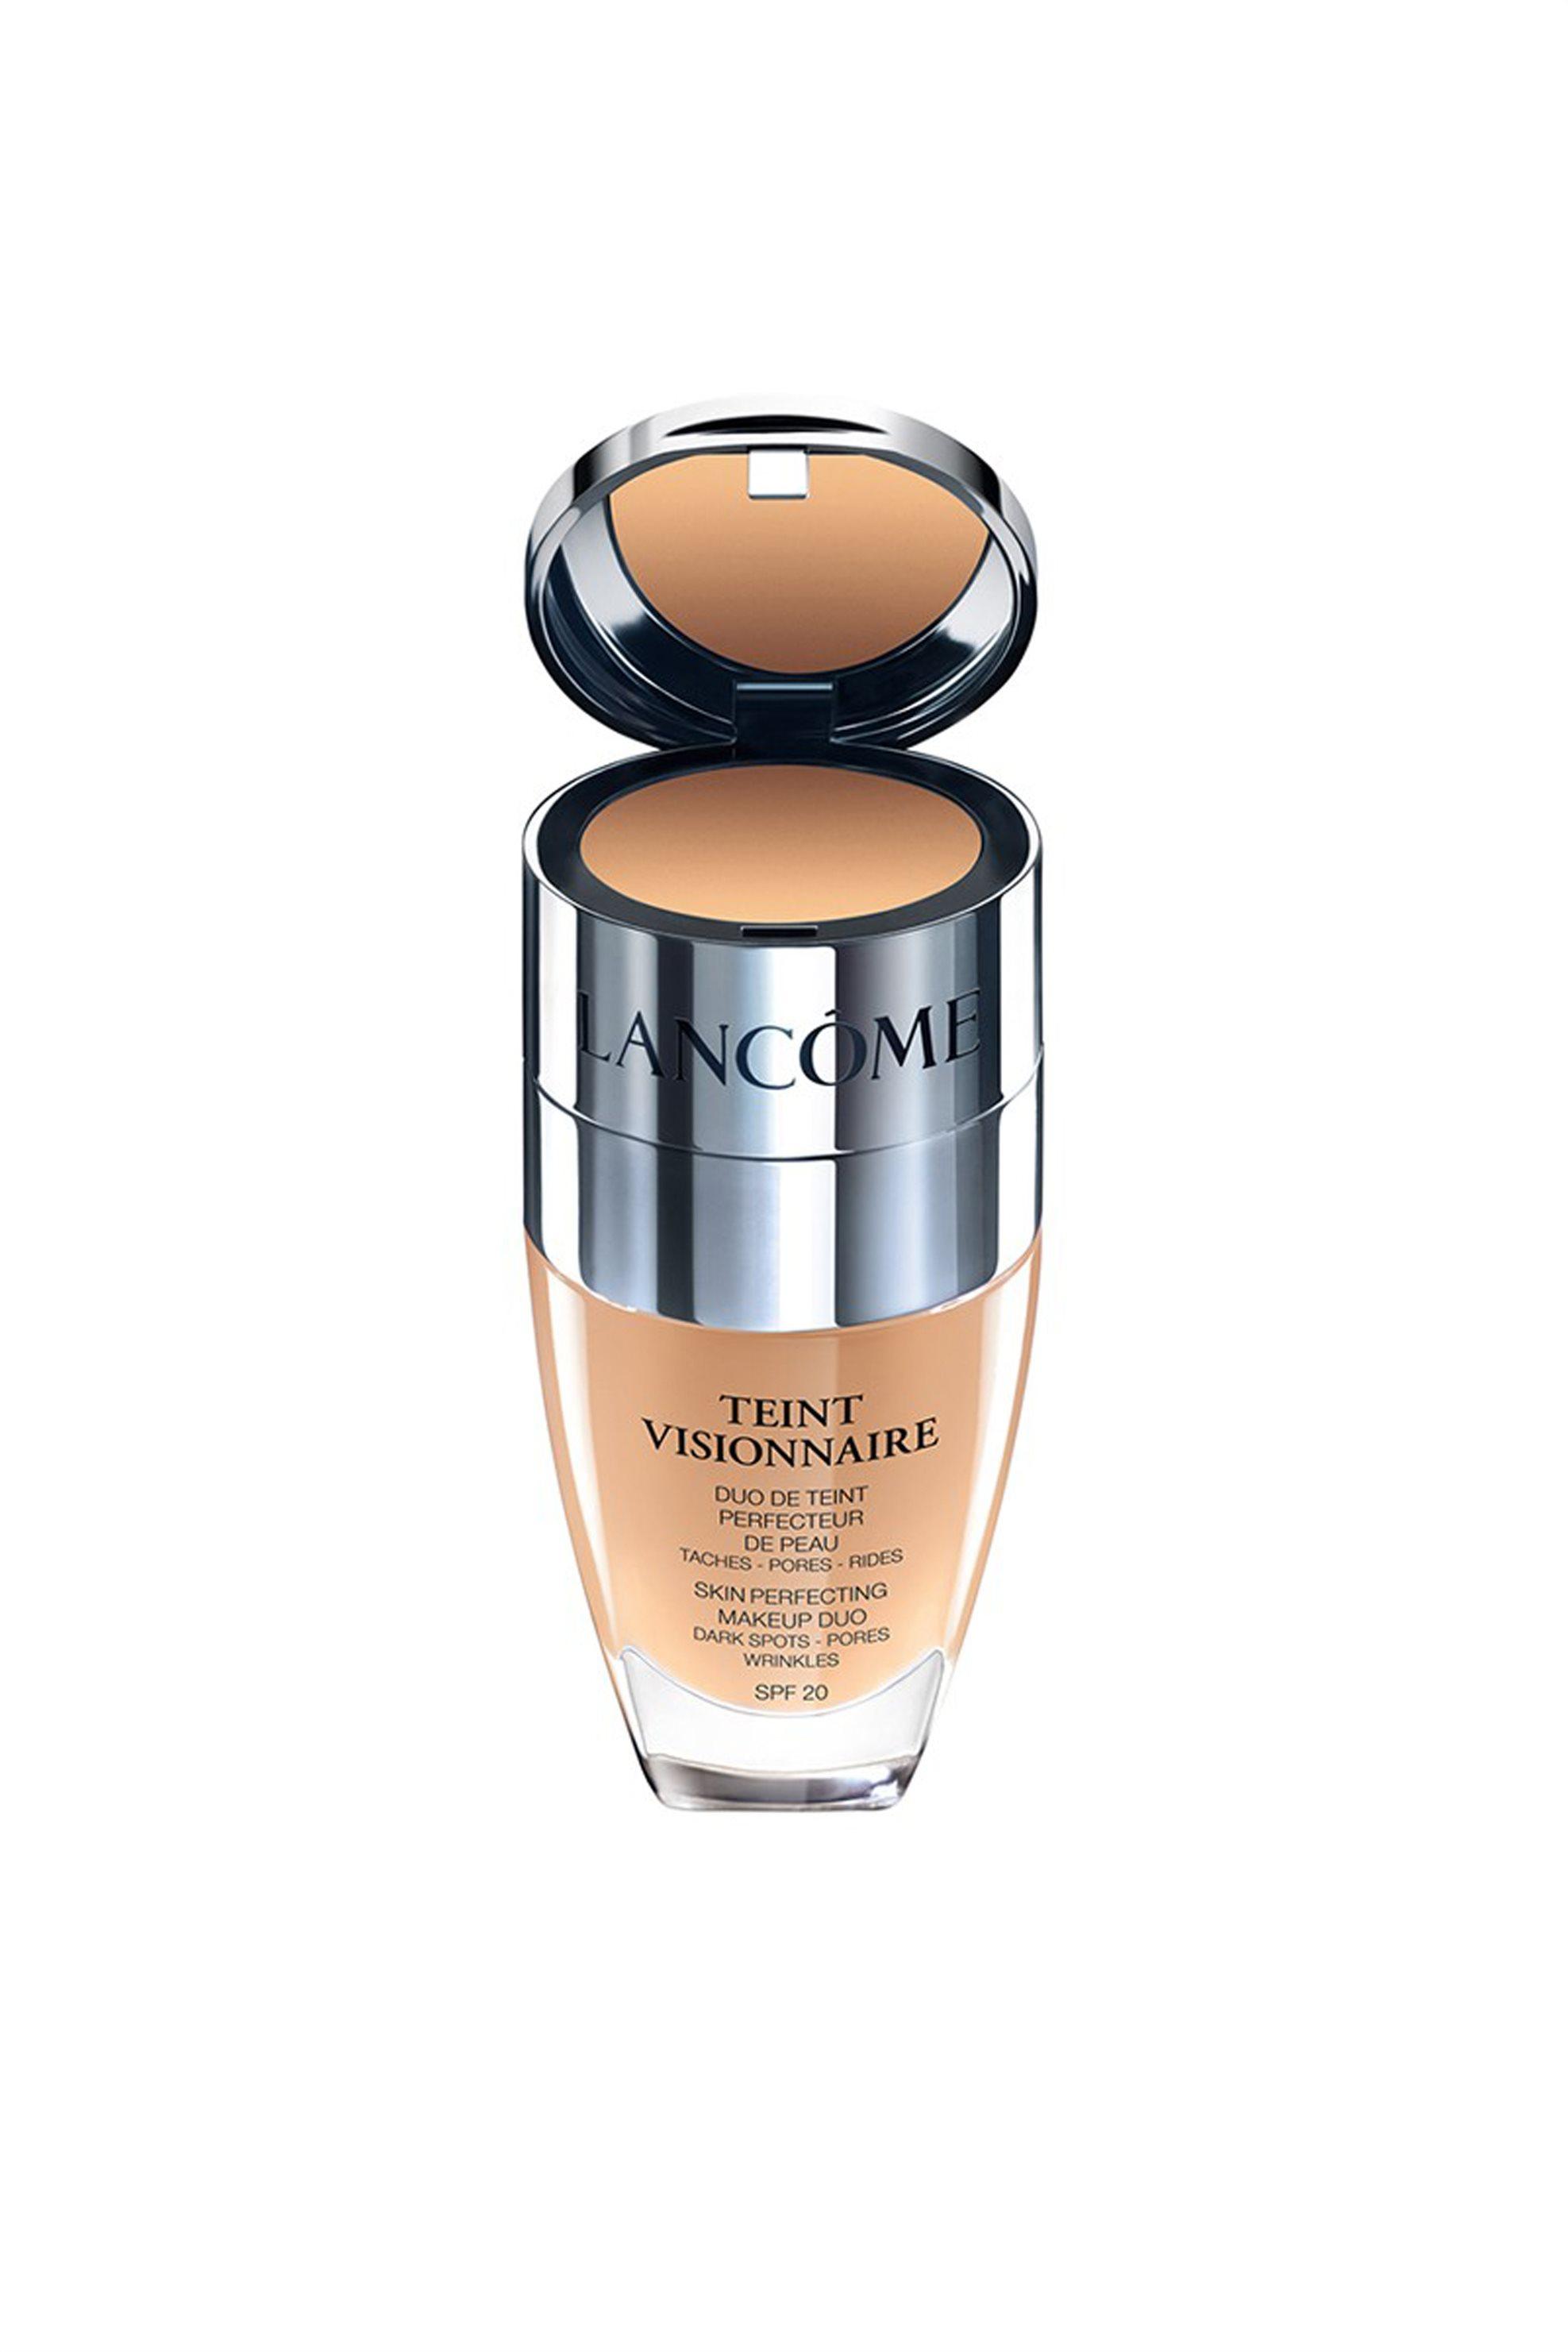 Lancôme Teint Visionnaire Skin Perfecting Makeup Duo 05 Beige Noisette 30 ml - 3 ομορφια   καλλυντικα επιλεκτικησ   μακιγιάζ   πρόσωπο   make ups   foundations